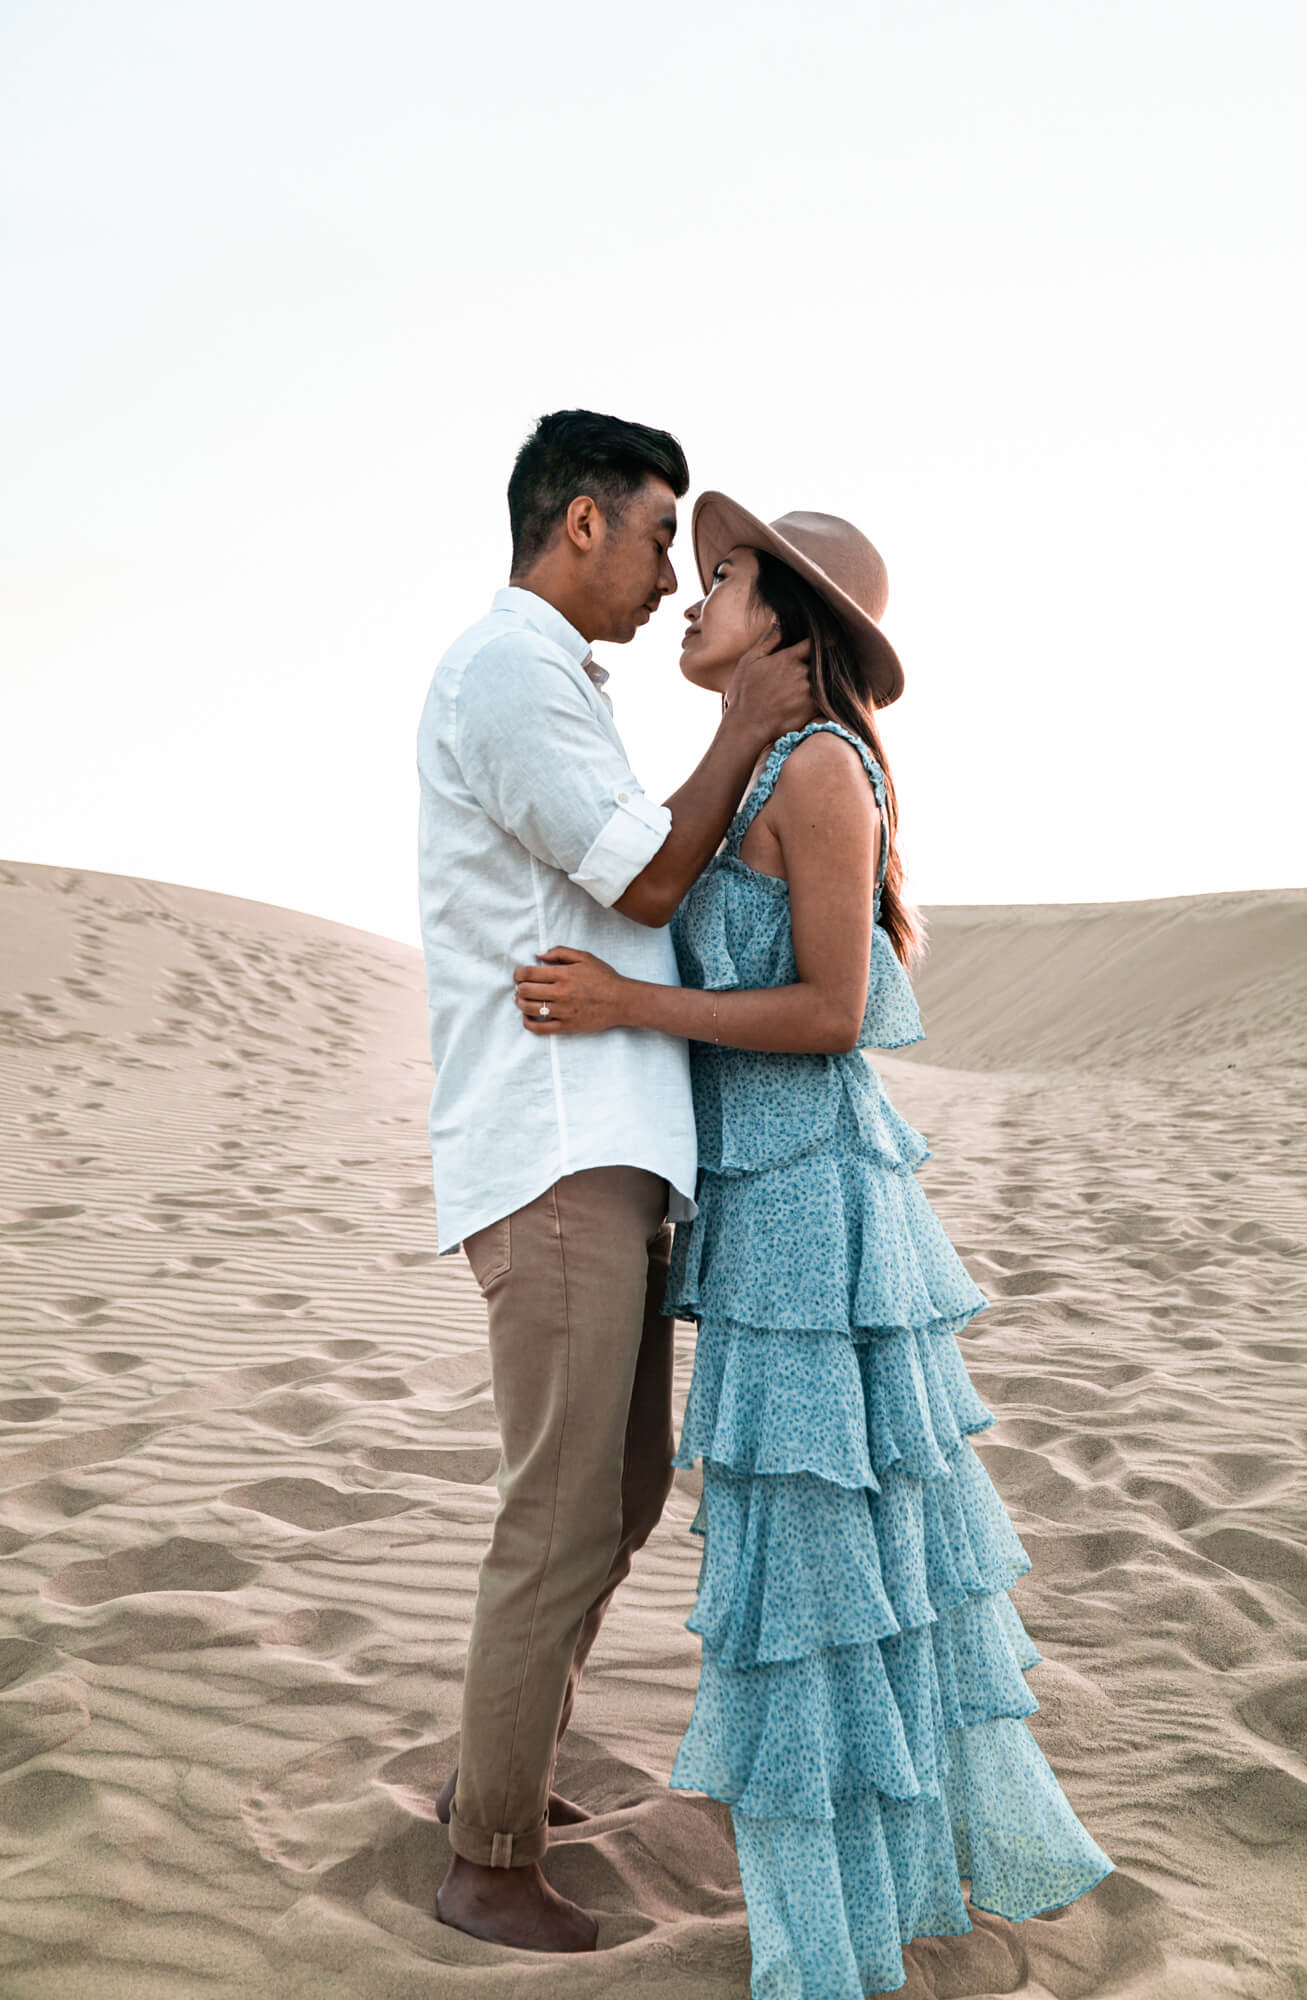 Romantic couple having pre-wedding shoot in sand dunes